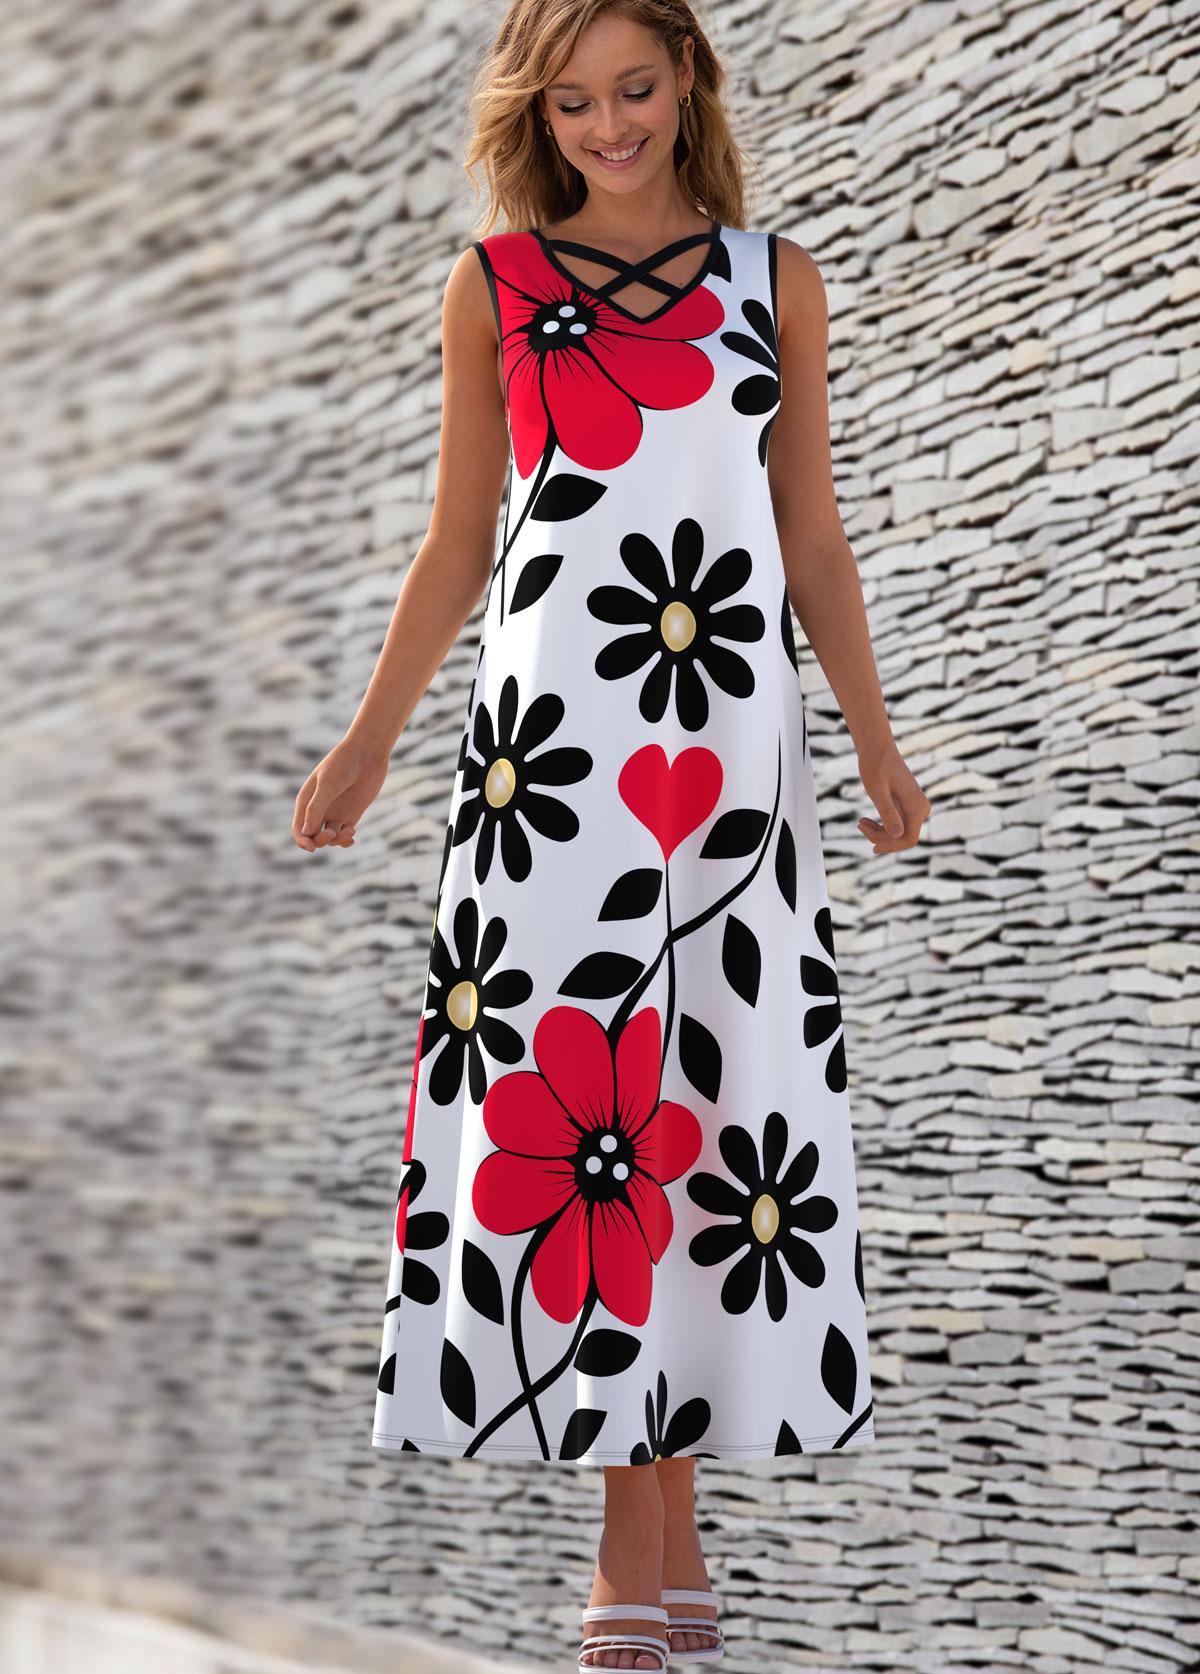 Floral Print Cross Strap Sleeveless Dress